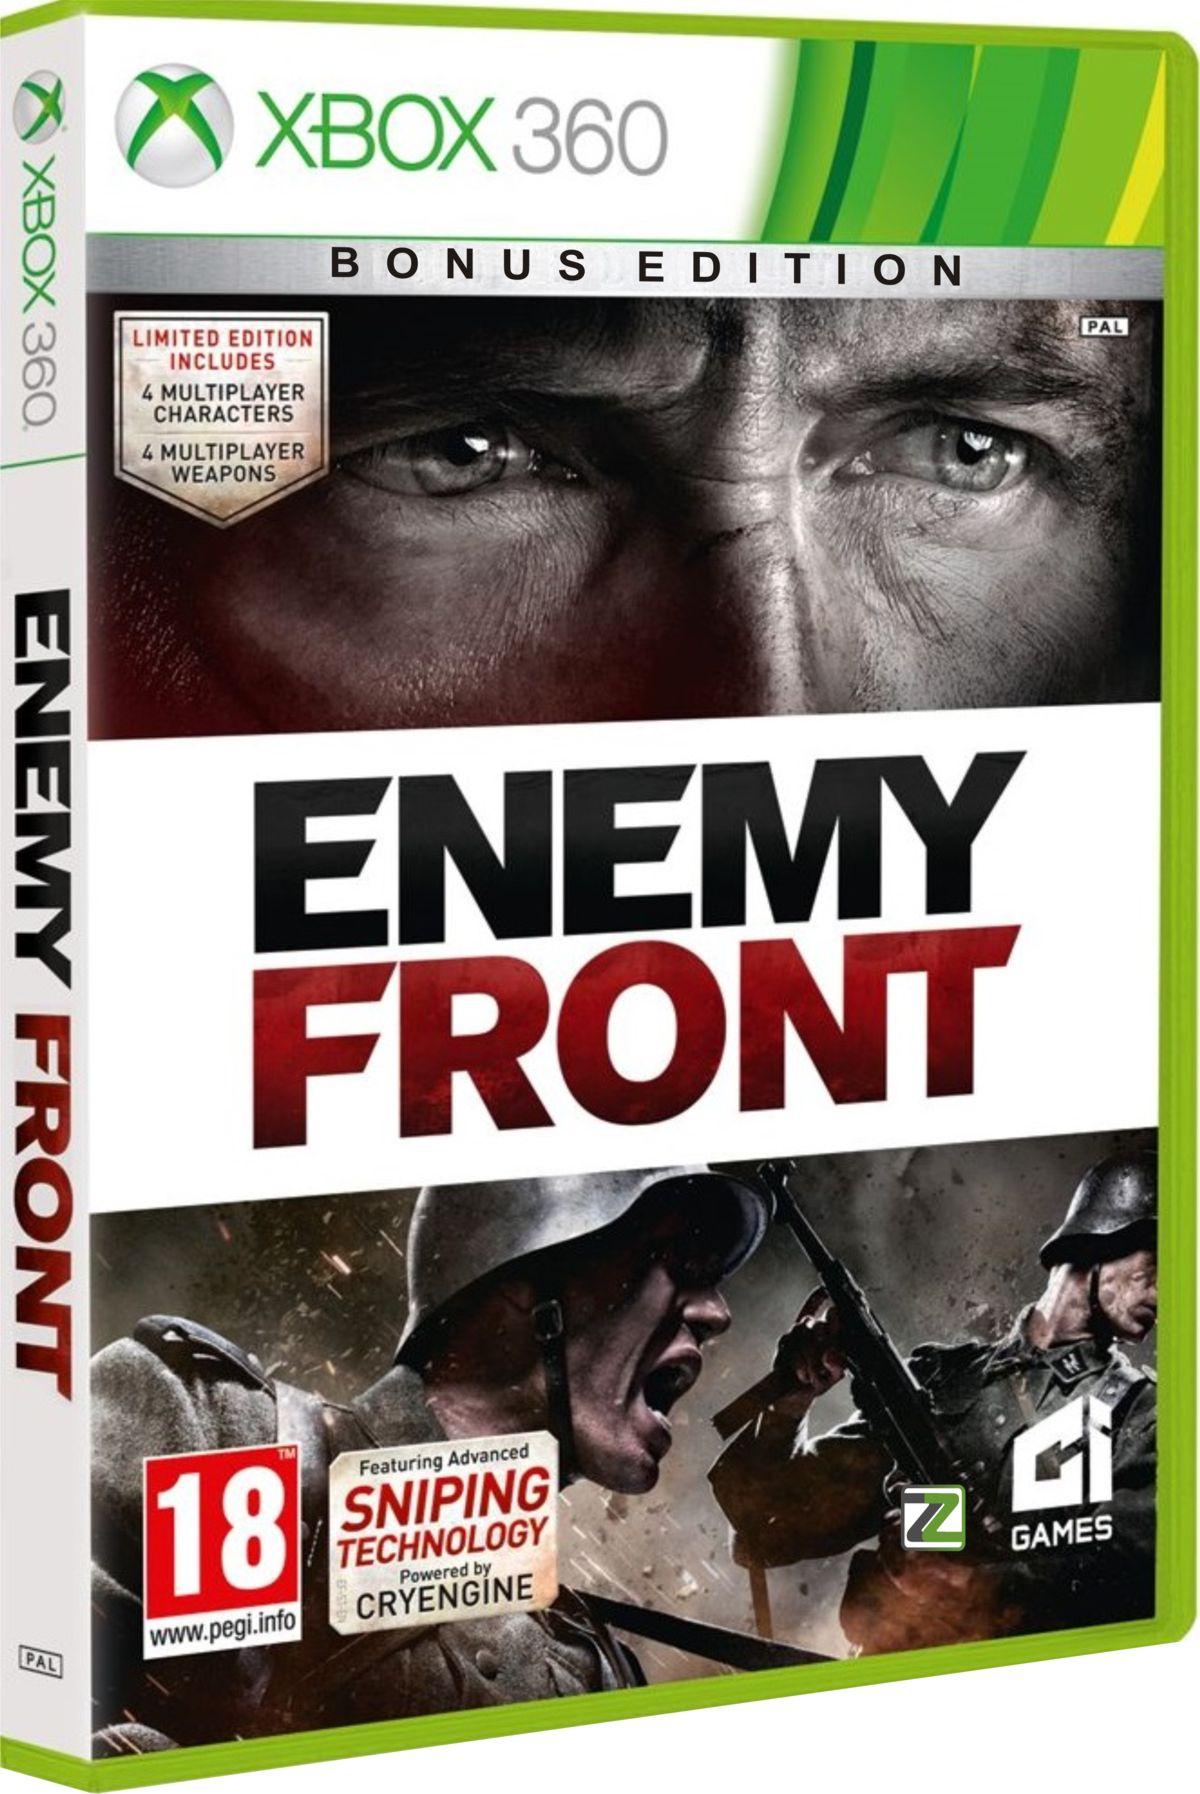 ENEMY FRONT Bonus Edition - X360